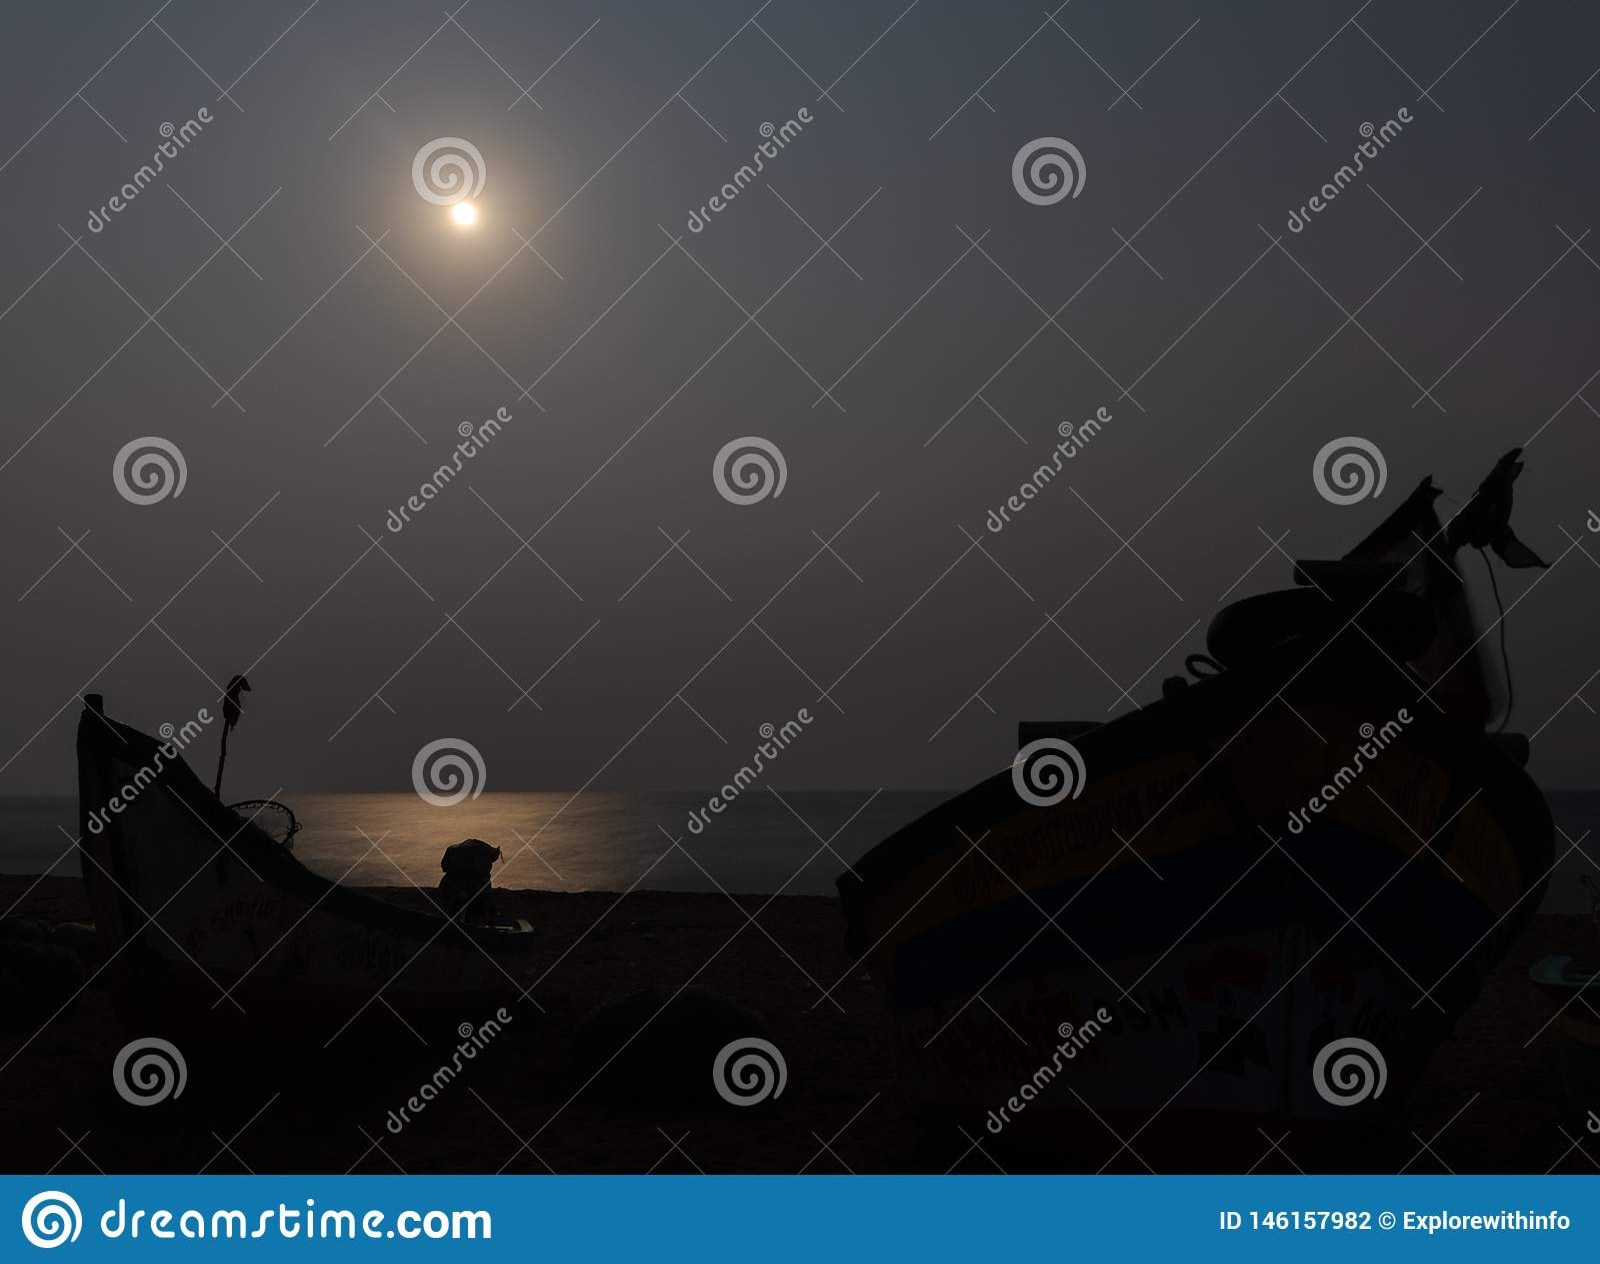 Moon light at seashore with fisherman boat shadow